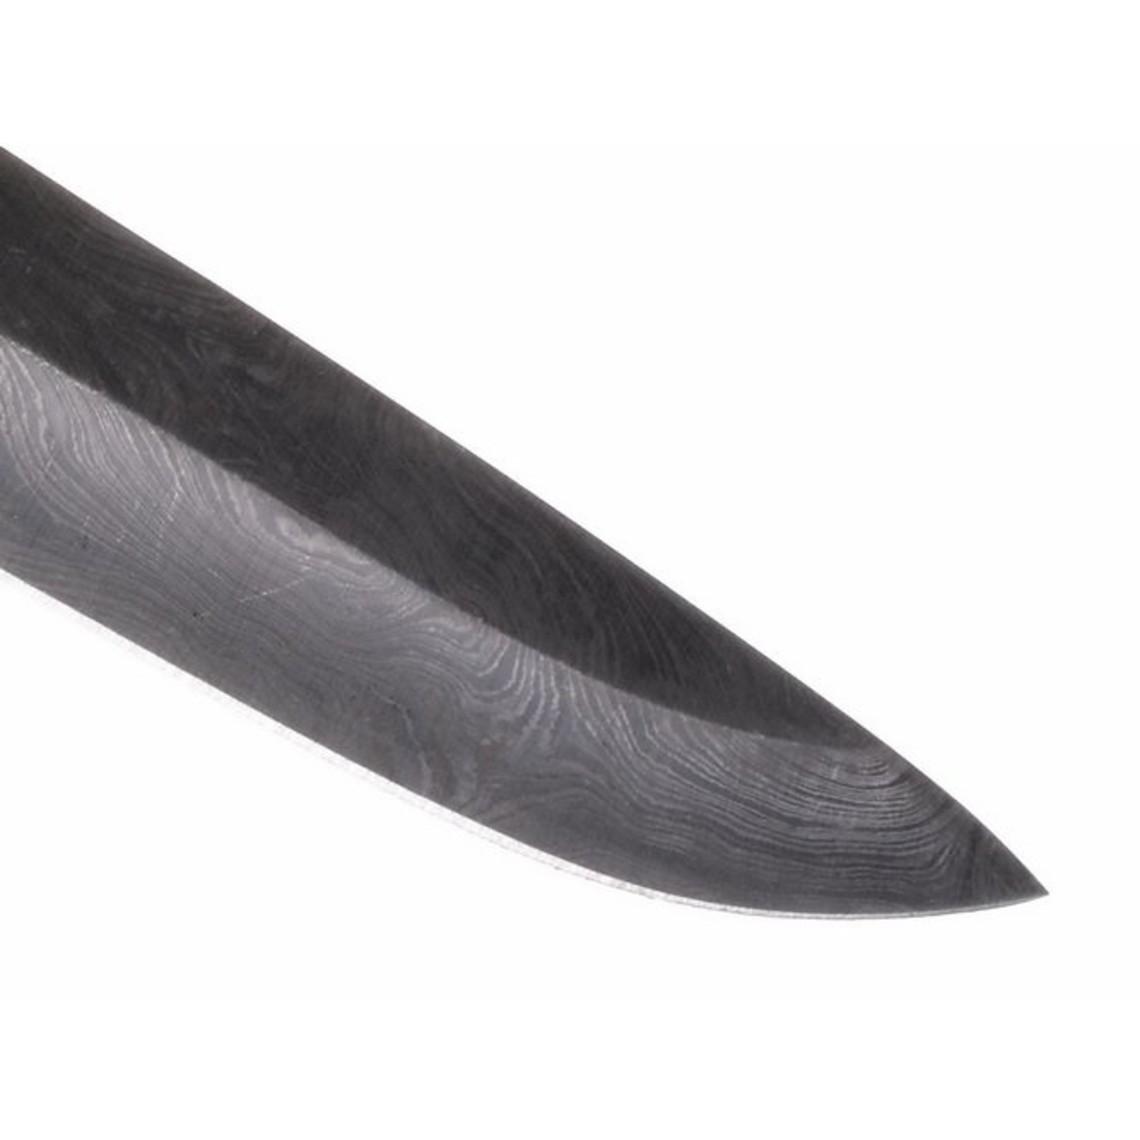 Cuchilla acero damasco, 22 cm.